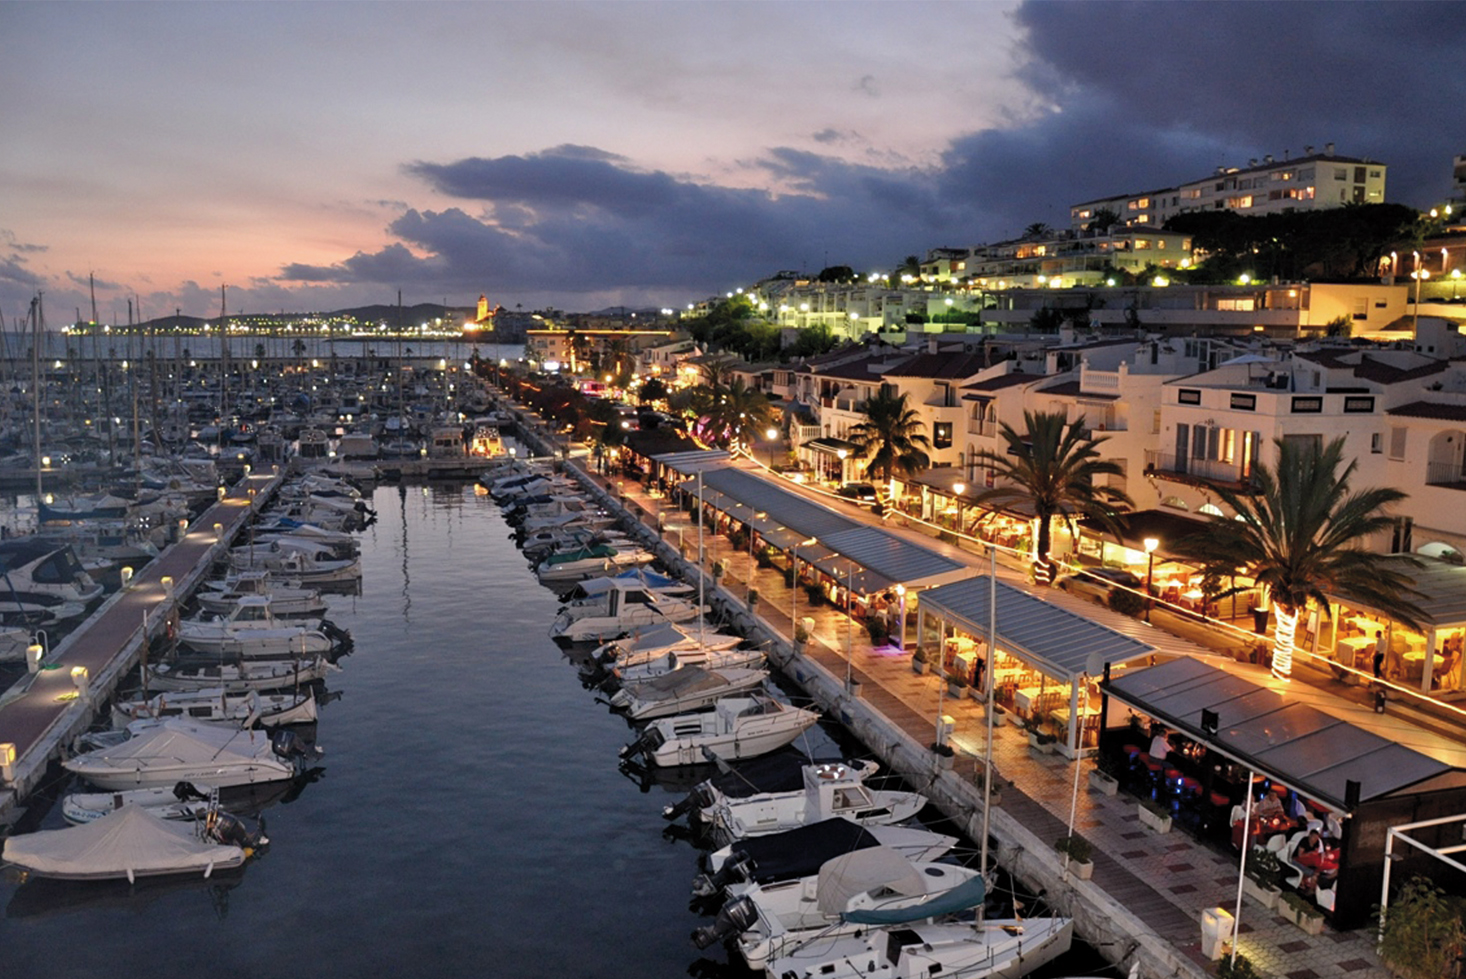 Port-de-Sitges-Aiguadolc-Atardecer-3